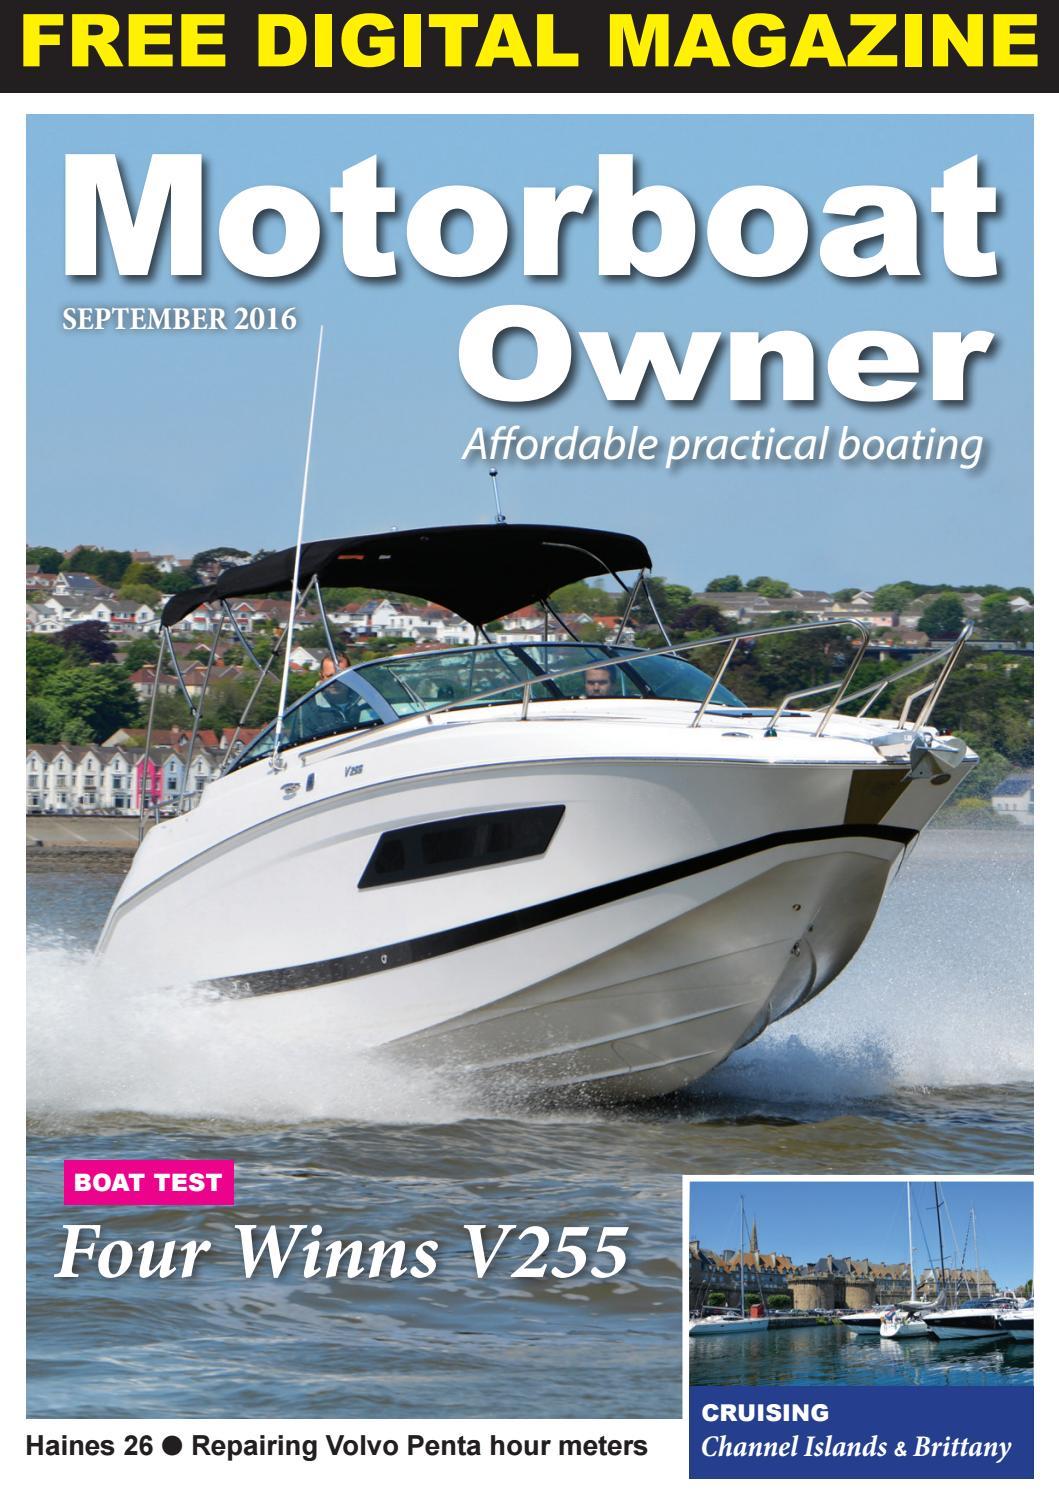 Motorboat Owner September 2016 By Digital Marine Media Ltd Issuu Sea Ray Boat Wiring Diagram Inverter